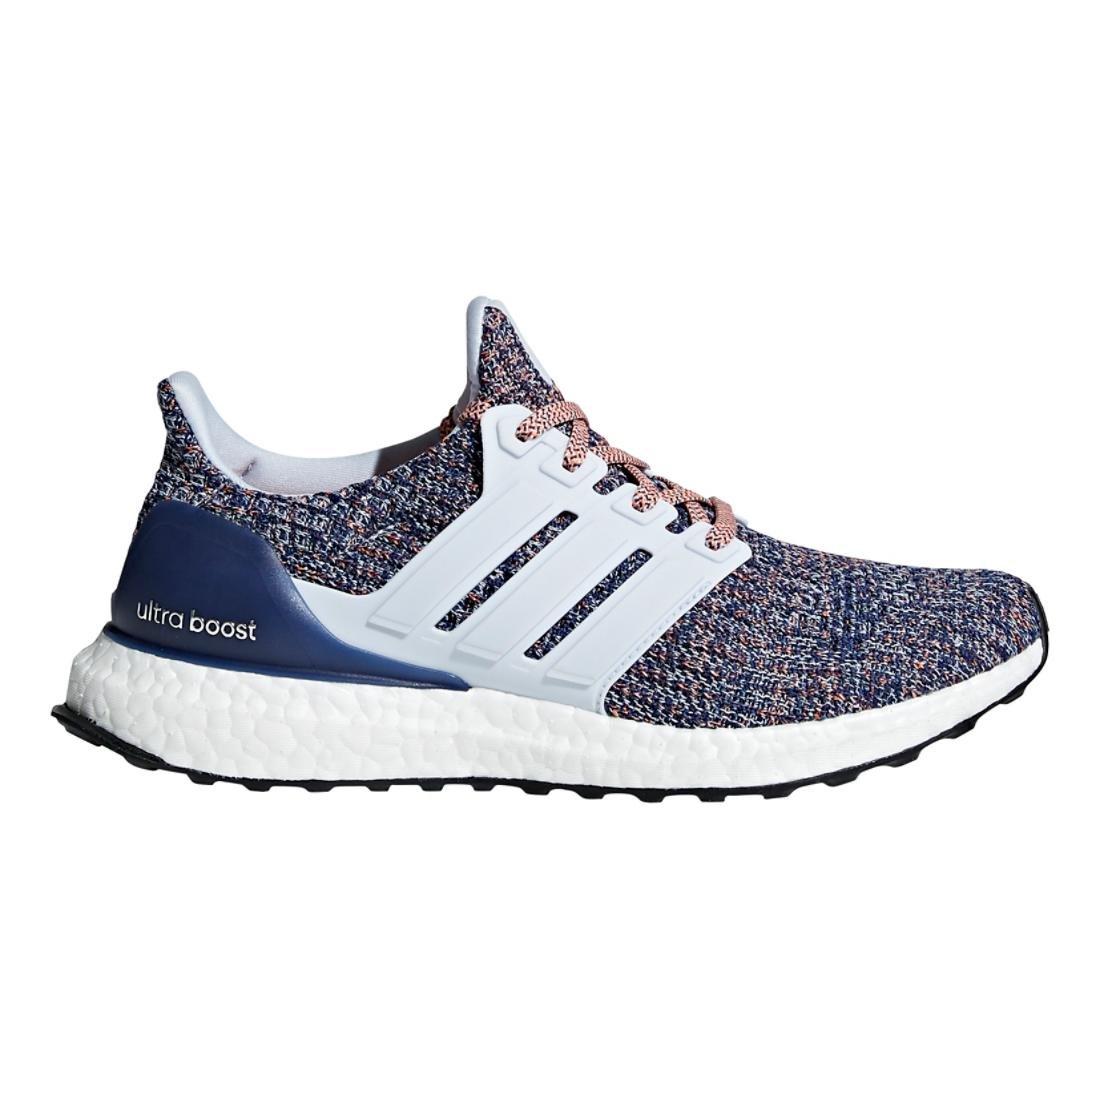 adidas Women's Ultraboost W Running Shoe B075R7WW94 10.5 B(M) US|Aero Blue S, Aero Blue S, Noble Indigo S